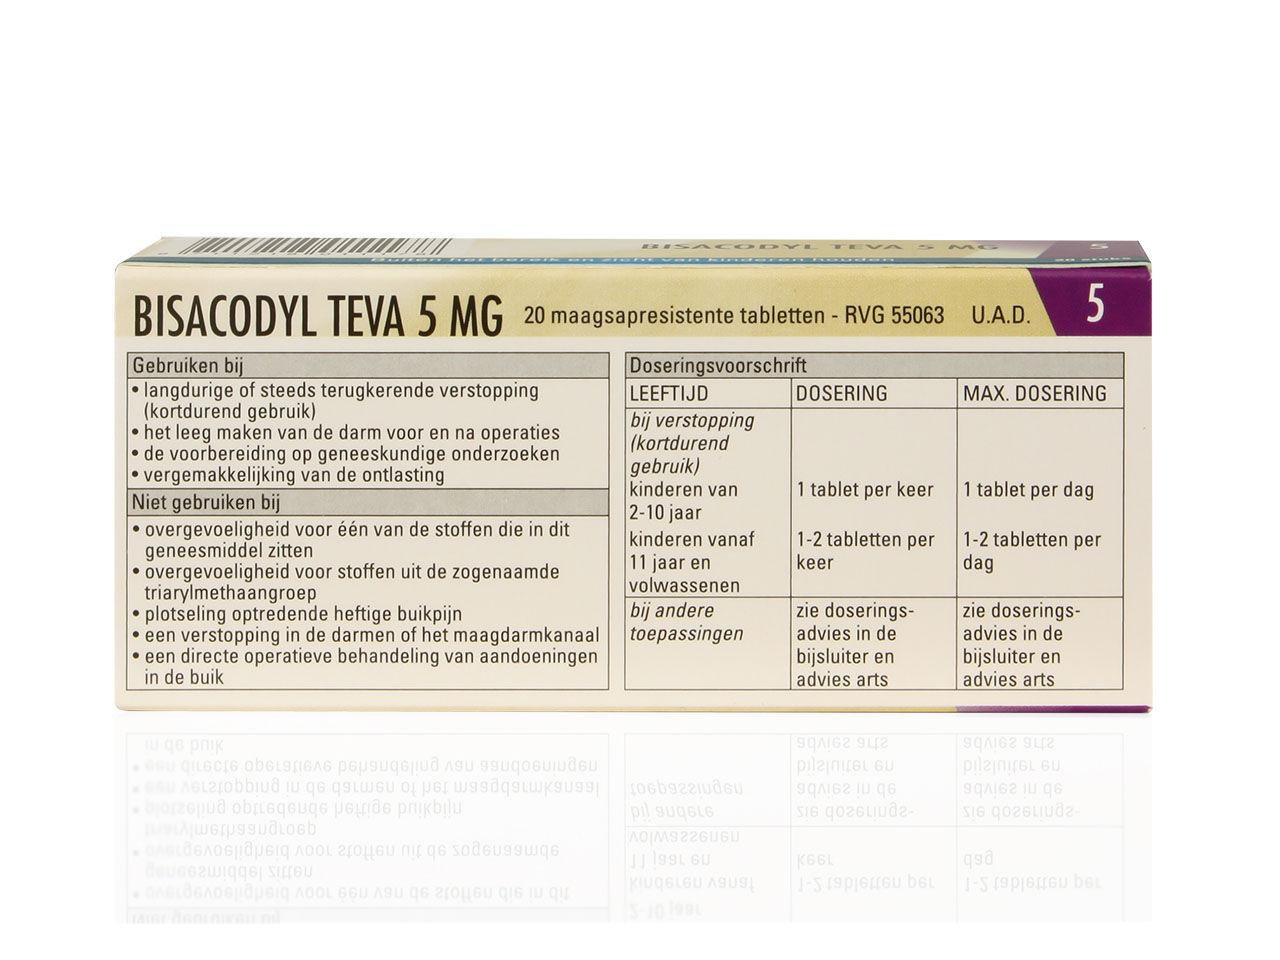 Bisacodyl Teva Tablet Msr 5mg